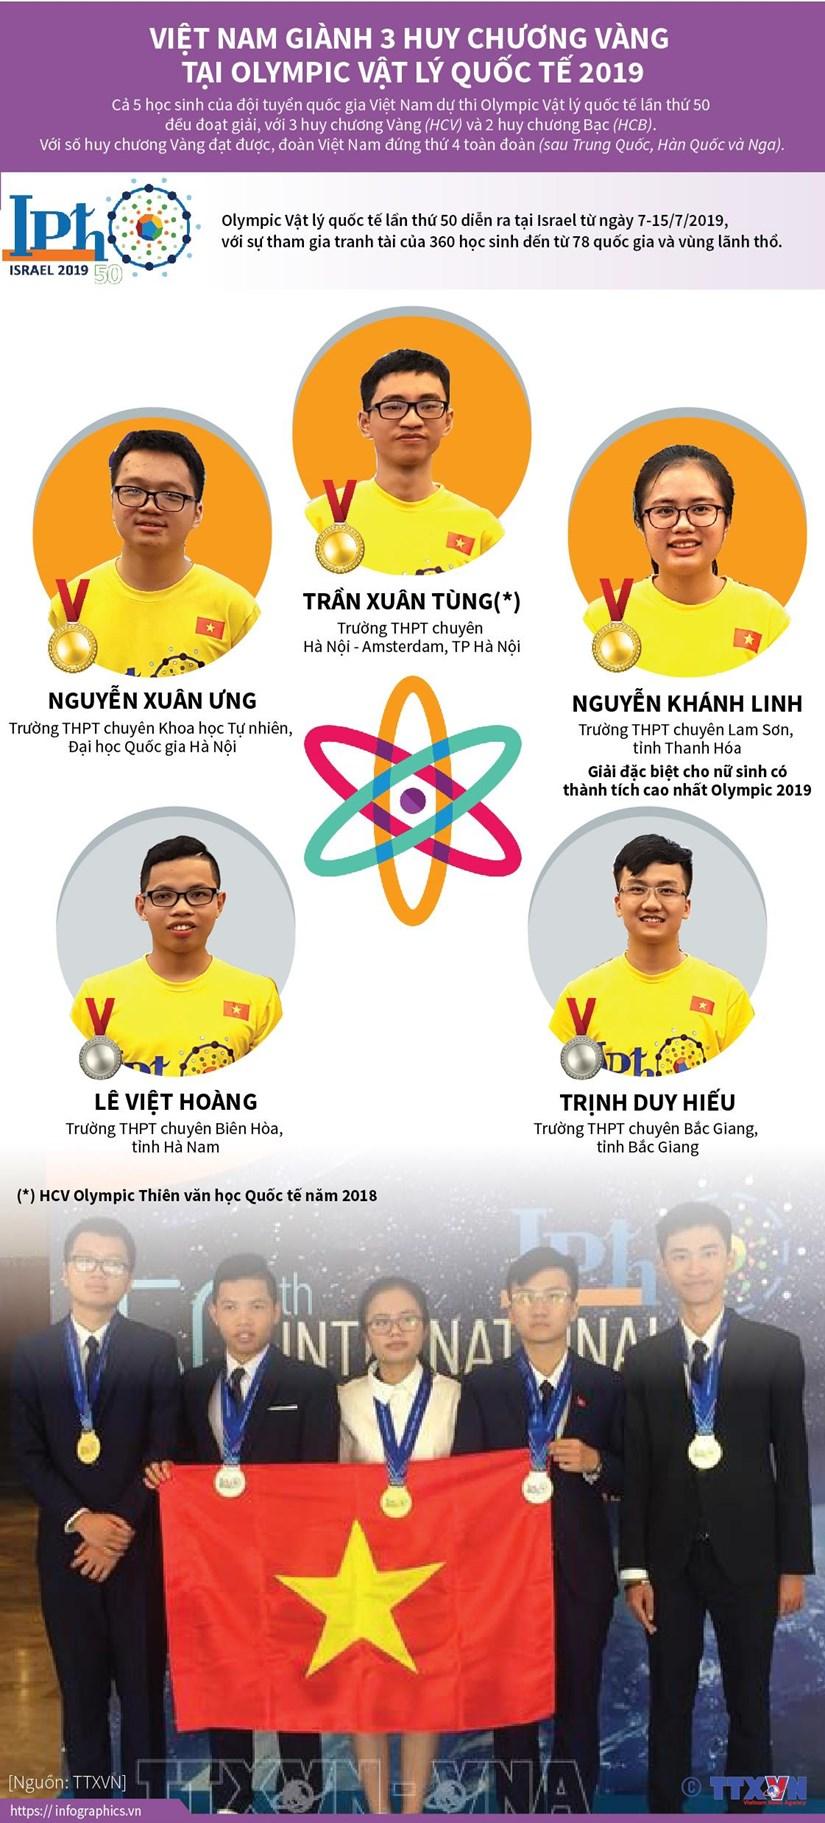 Viet Nam gianh 3 huy chuong Vang tai Olympic Vat ly quoc te 2019 hinh anh 1